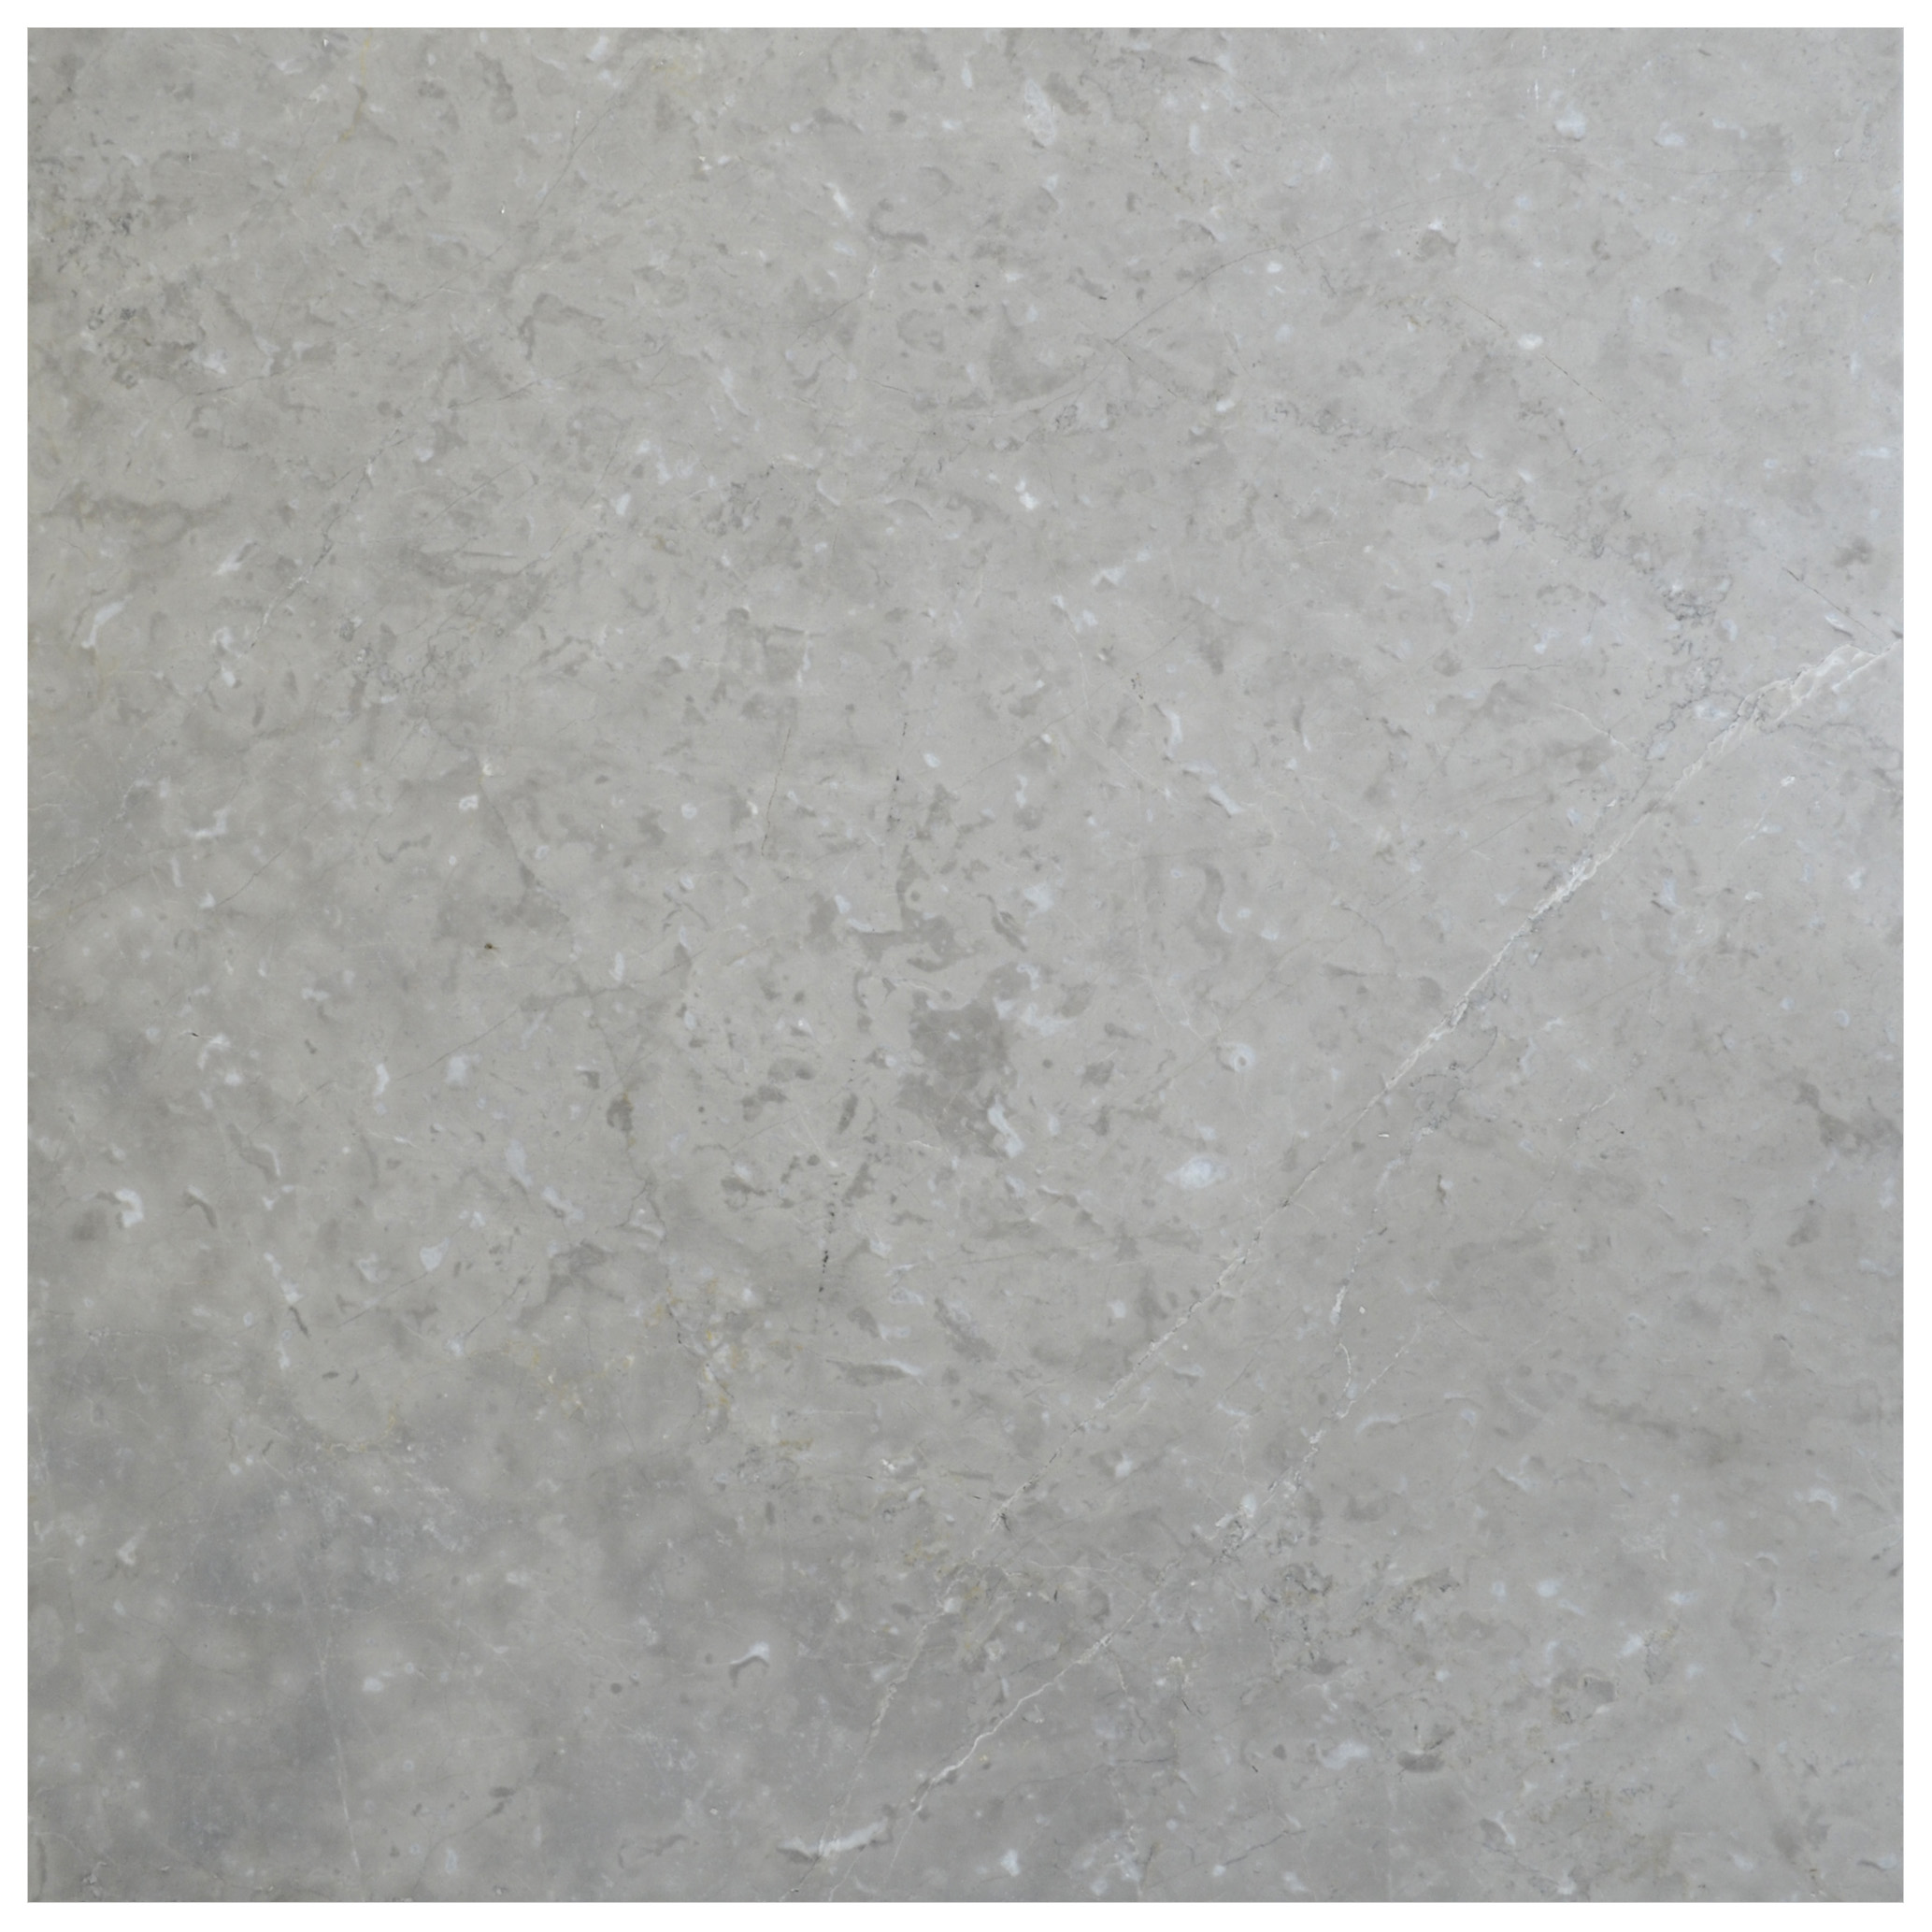 Silver Belinda Polished Marble Tiles 24x24-marble sale-Atlantic Stone Source